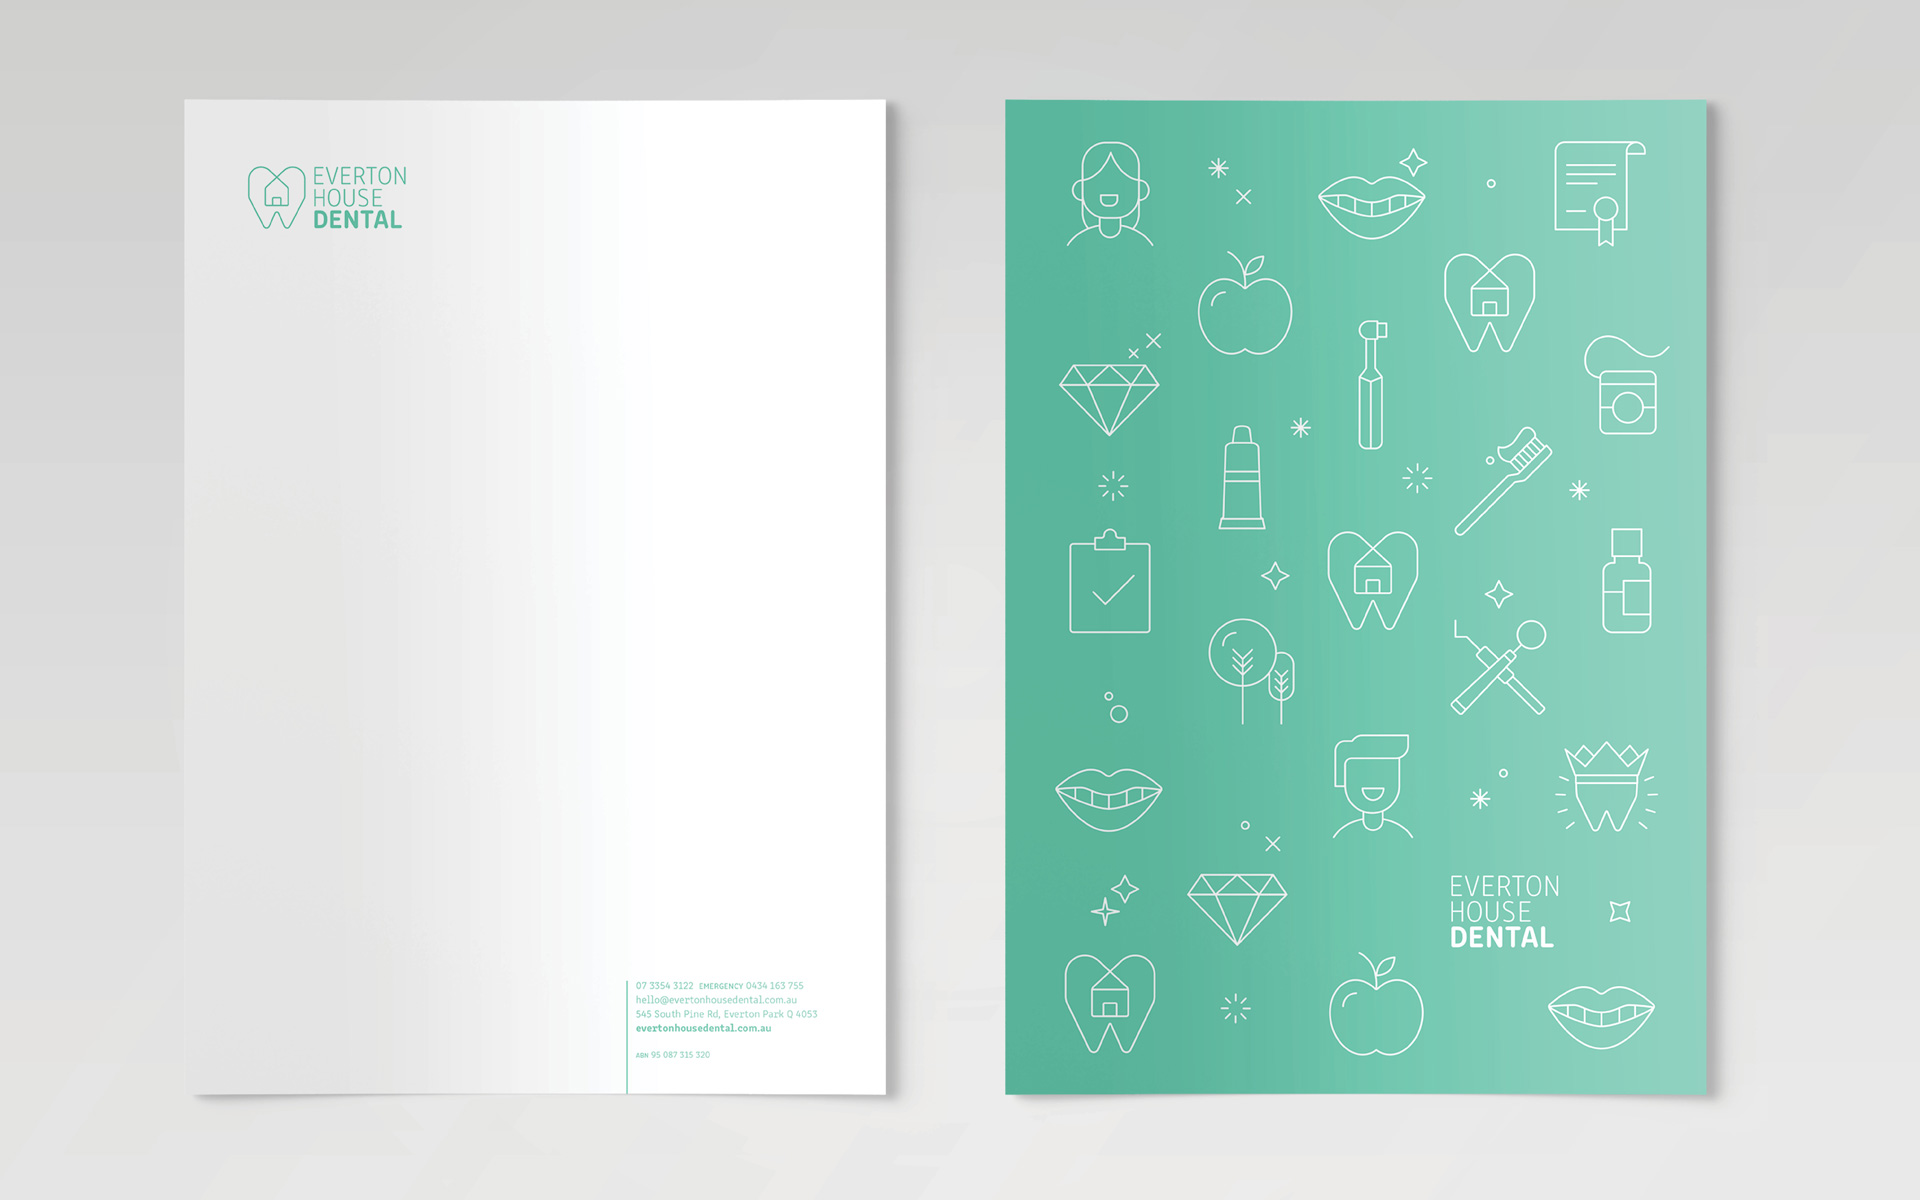 Everton House Dental Web Design Letterhead